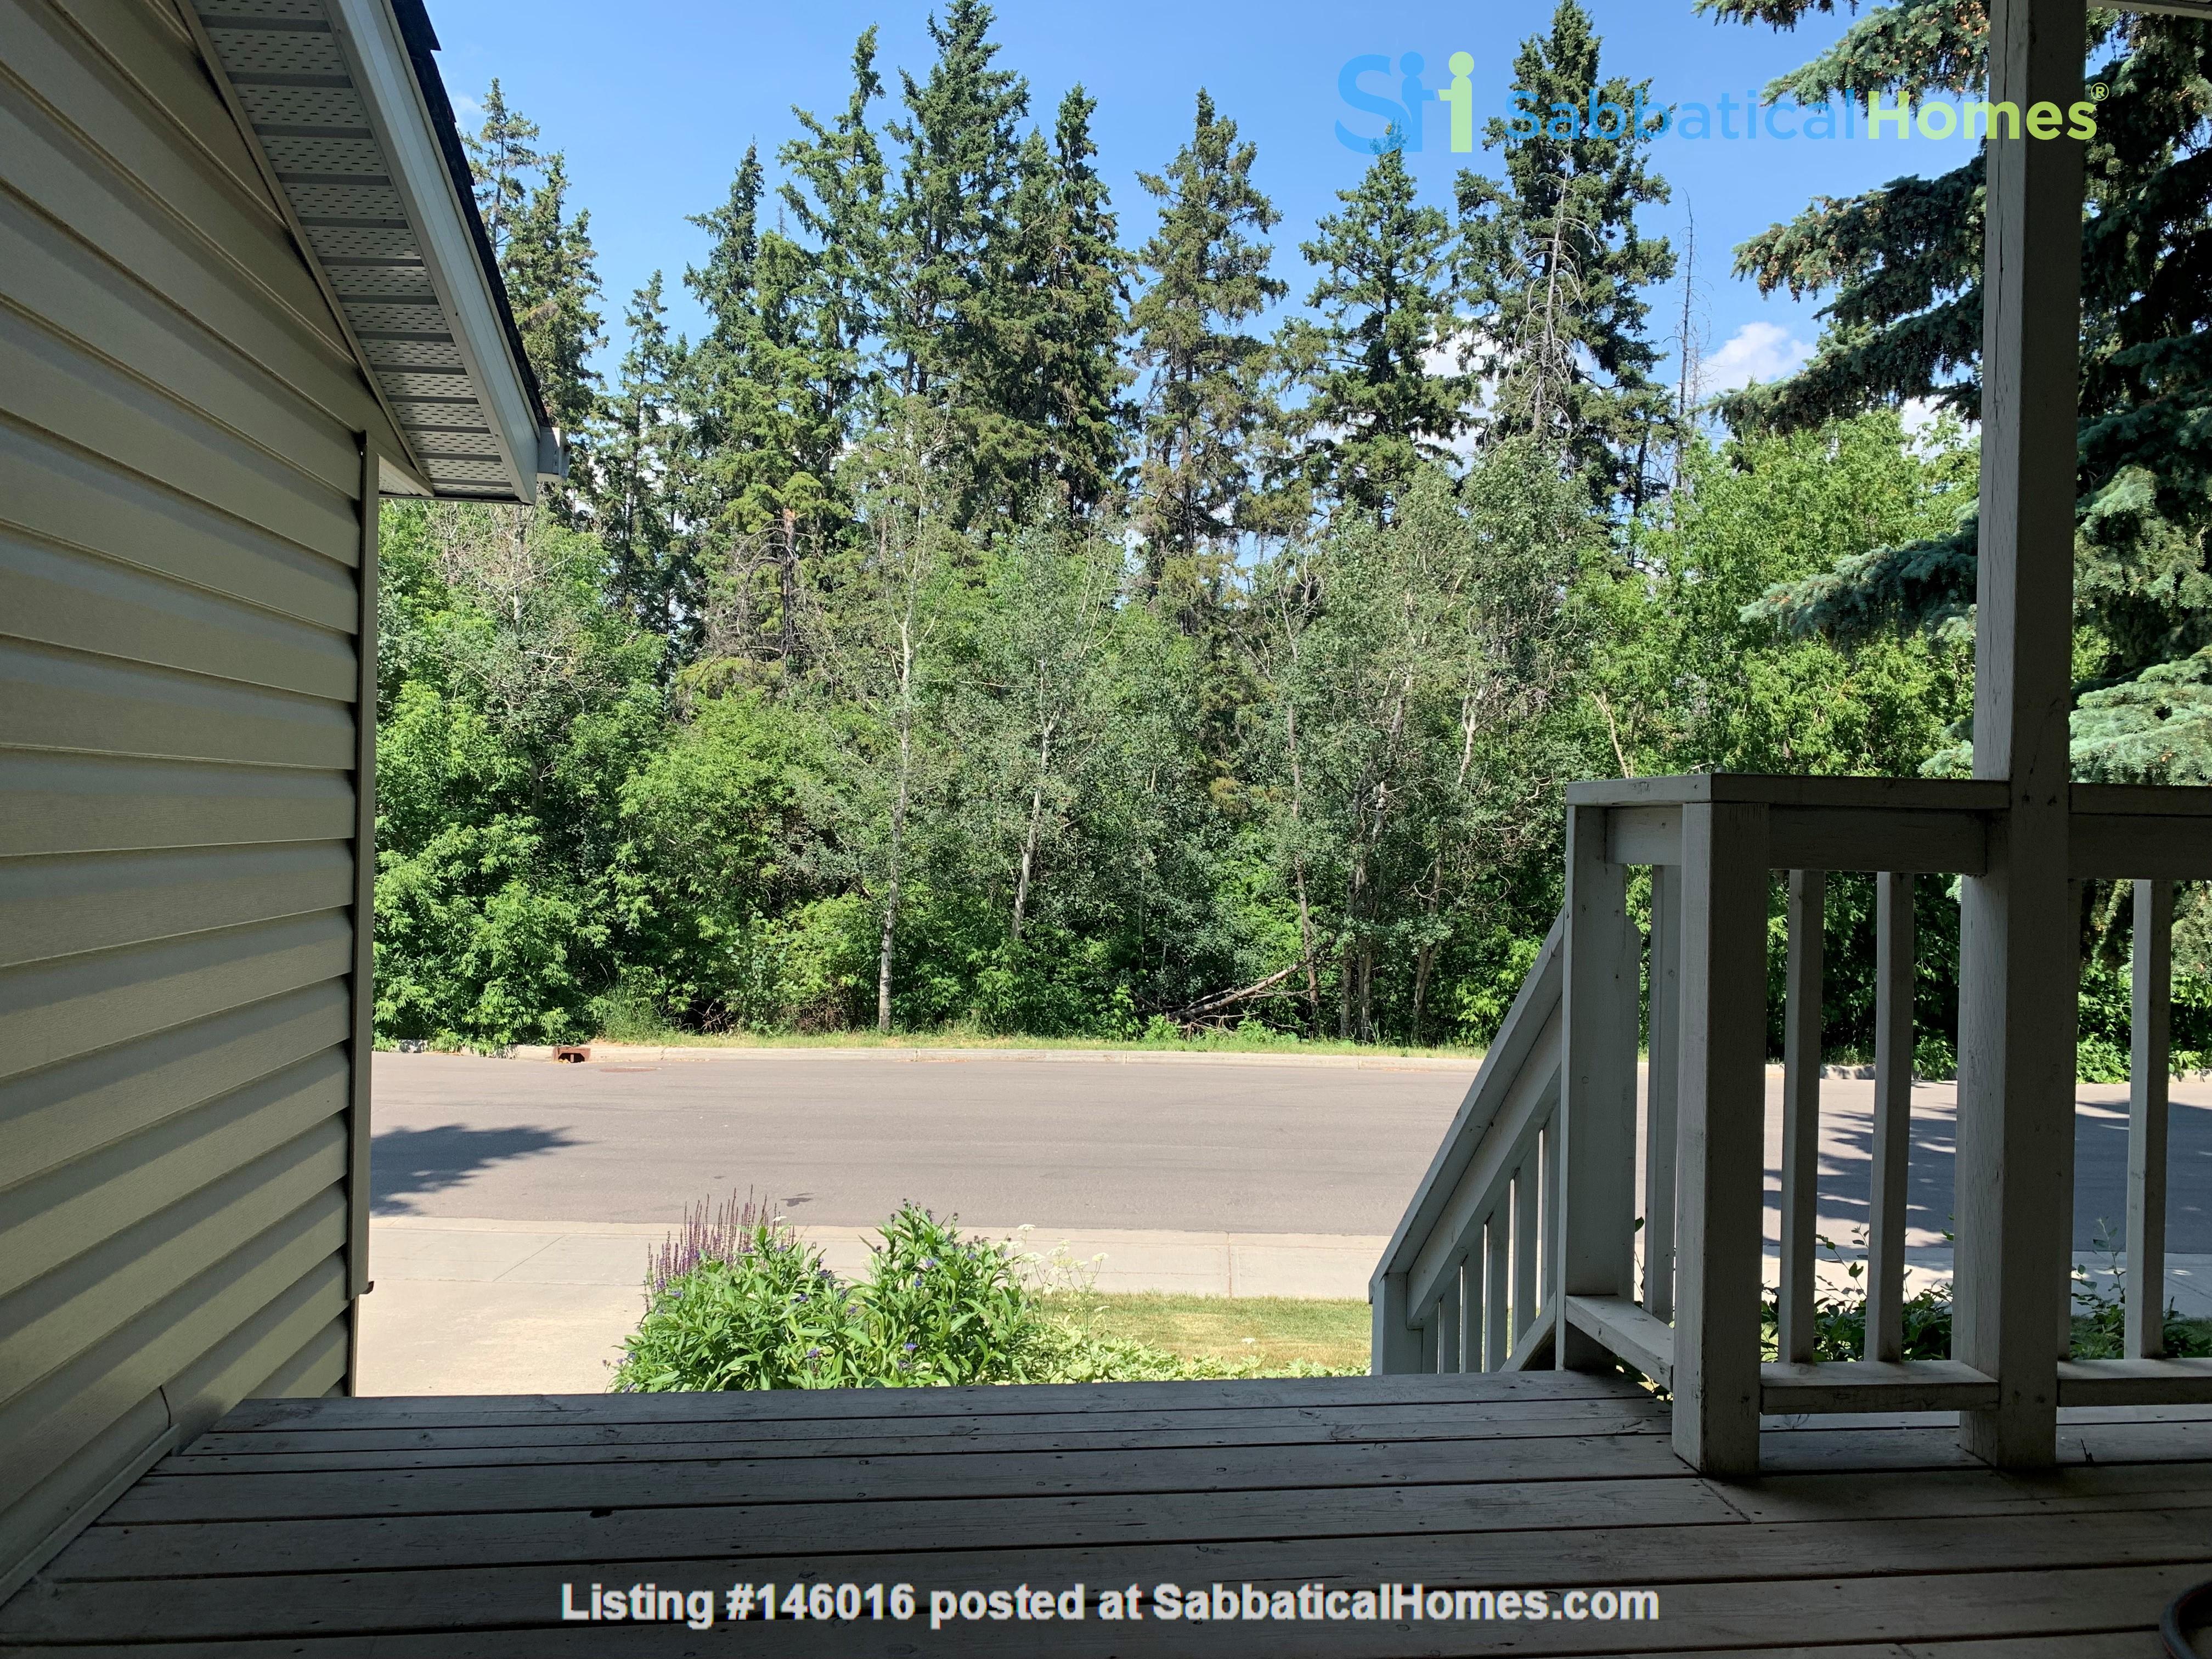 Forest haven sabbatical home Home Rental in Edmonton 1